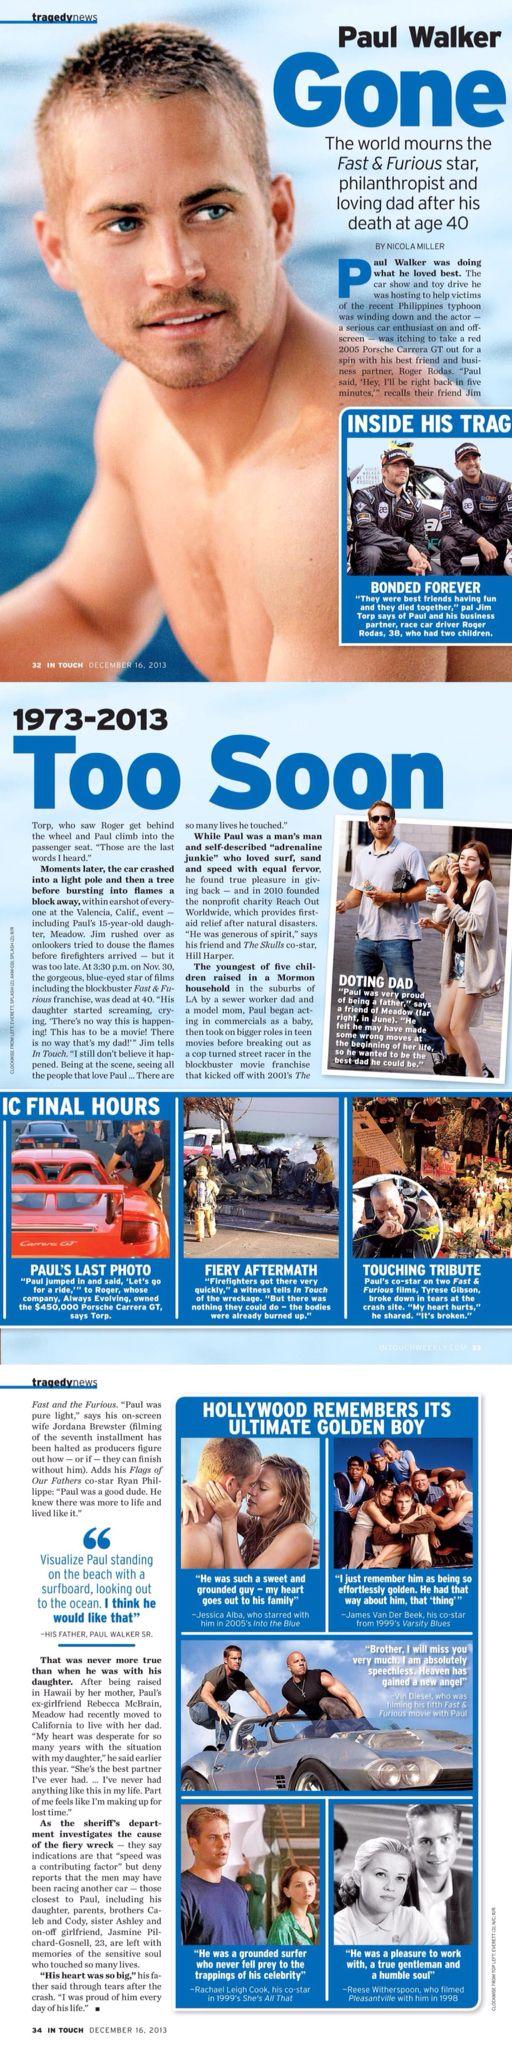 In Touch magazine 16th Dec 2013